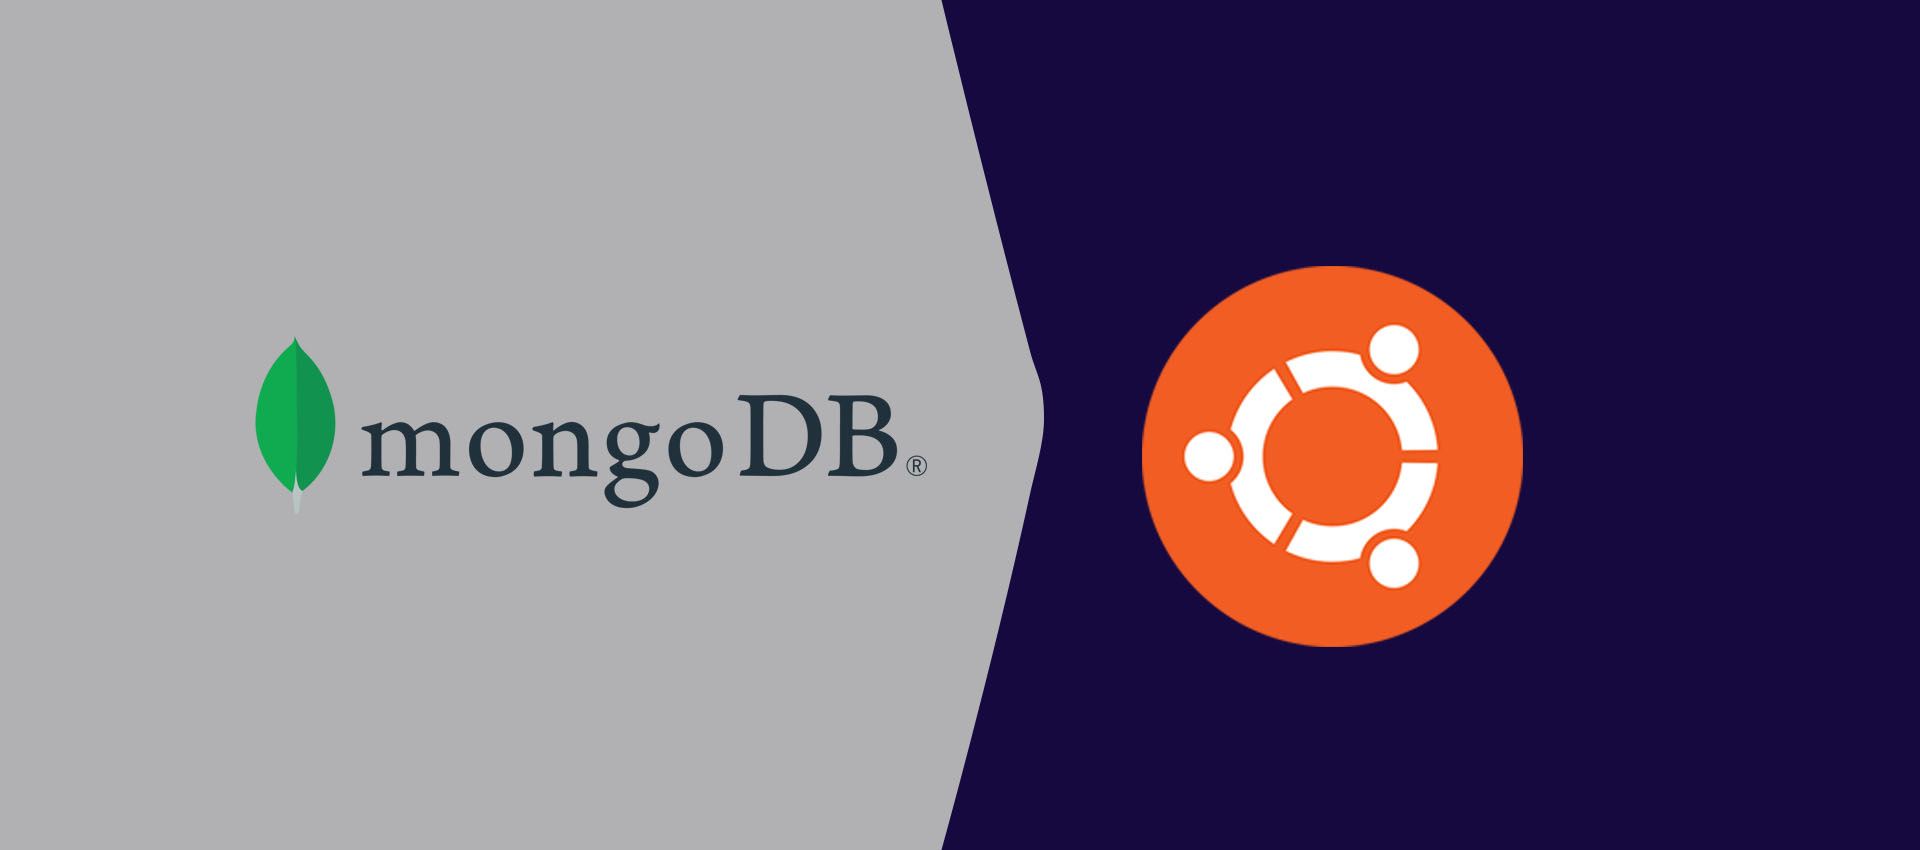 How To Install MongoDB 5 on Ubuntu 20.04 LTS